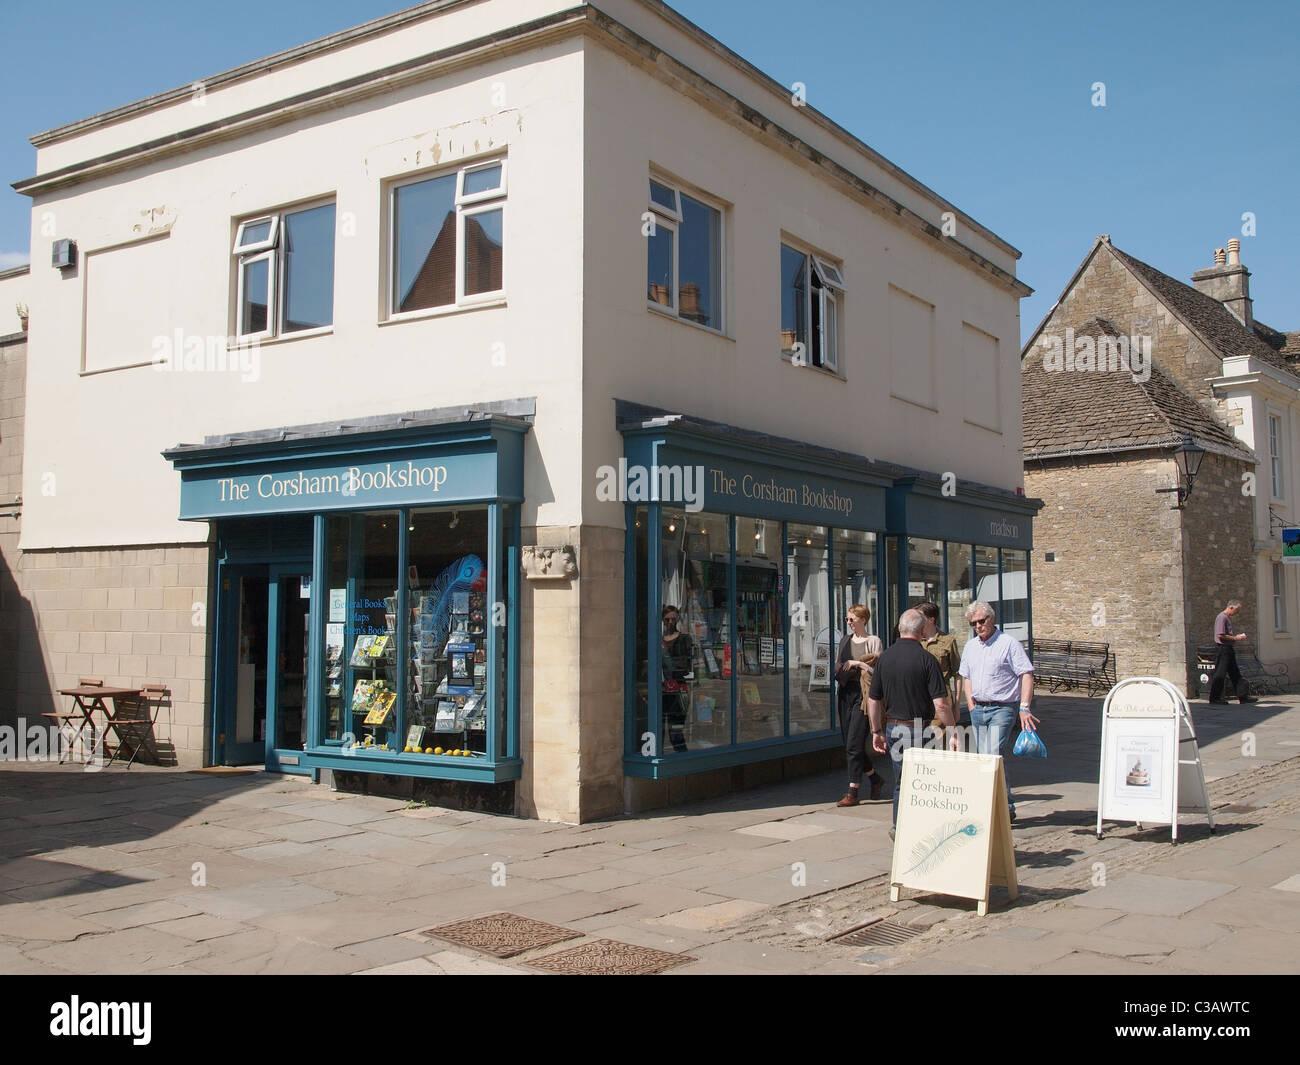 The Corsham Book Shop, Independant Bookshop, Wiltshire, England Stock Photo